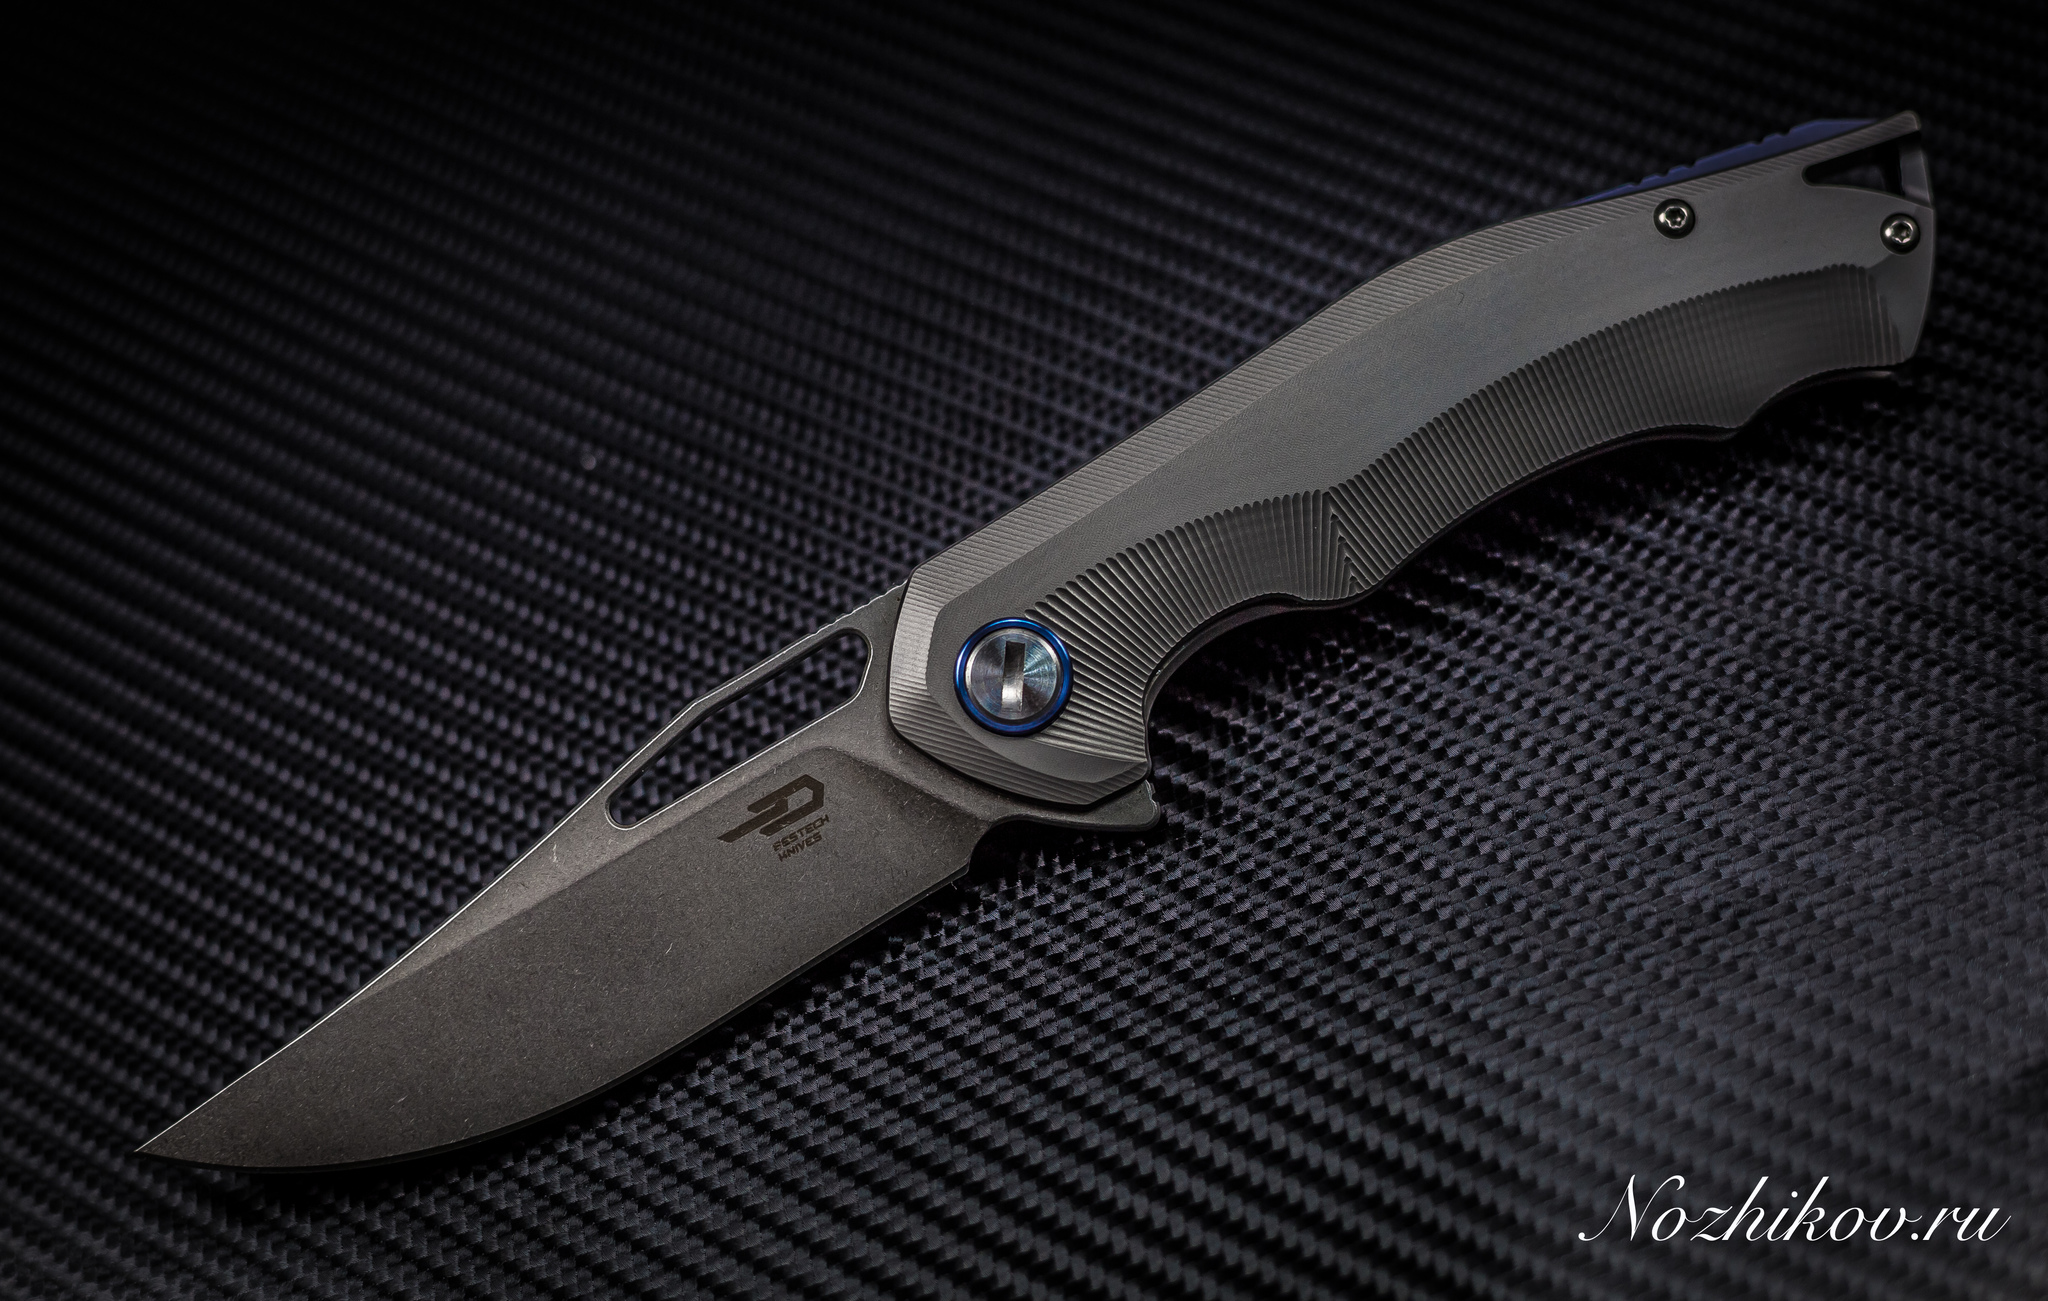 Складной нож Bestech Tercel BT1708B, сталь CPM-S35VN, рукоять титан